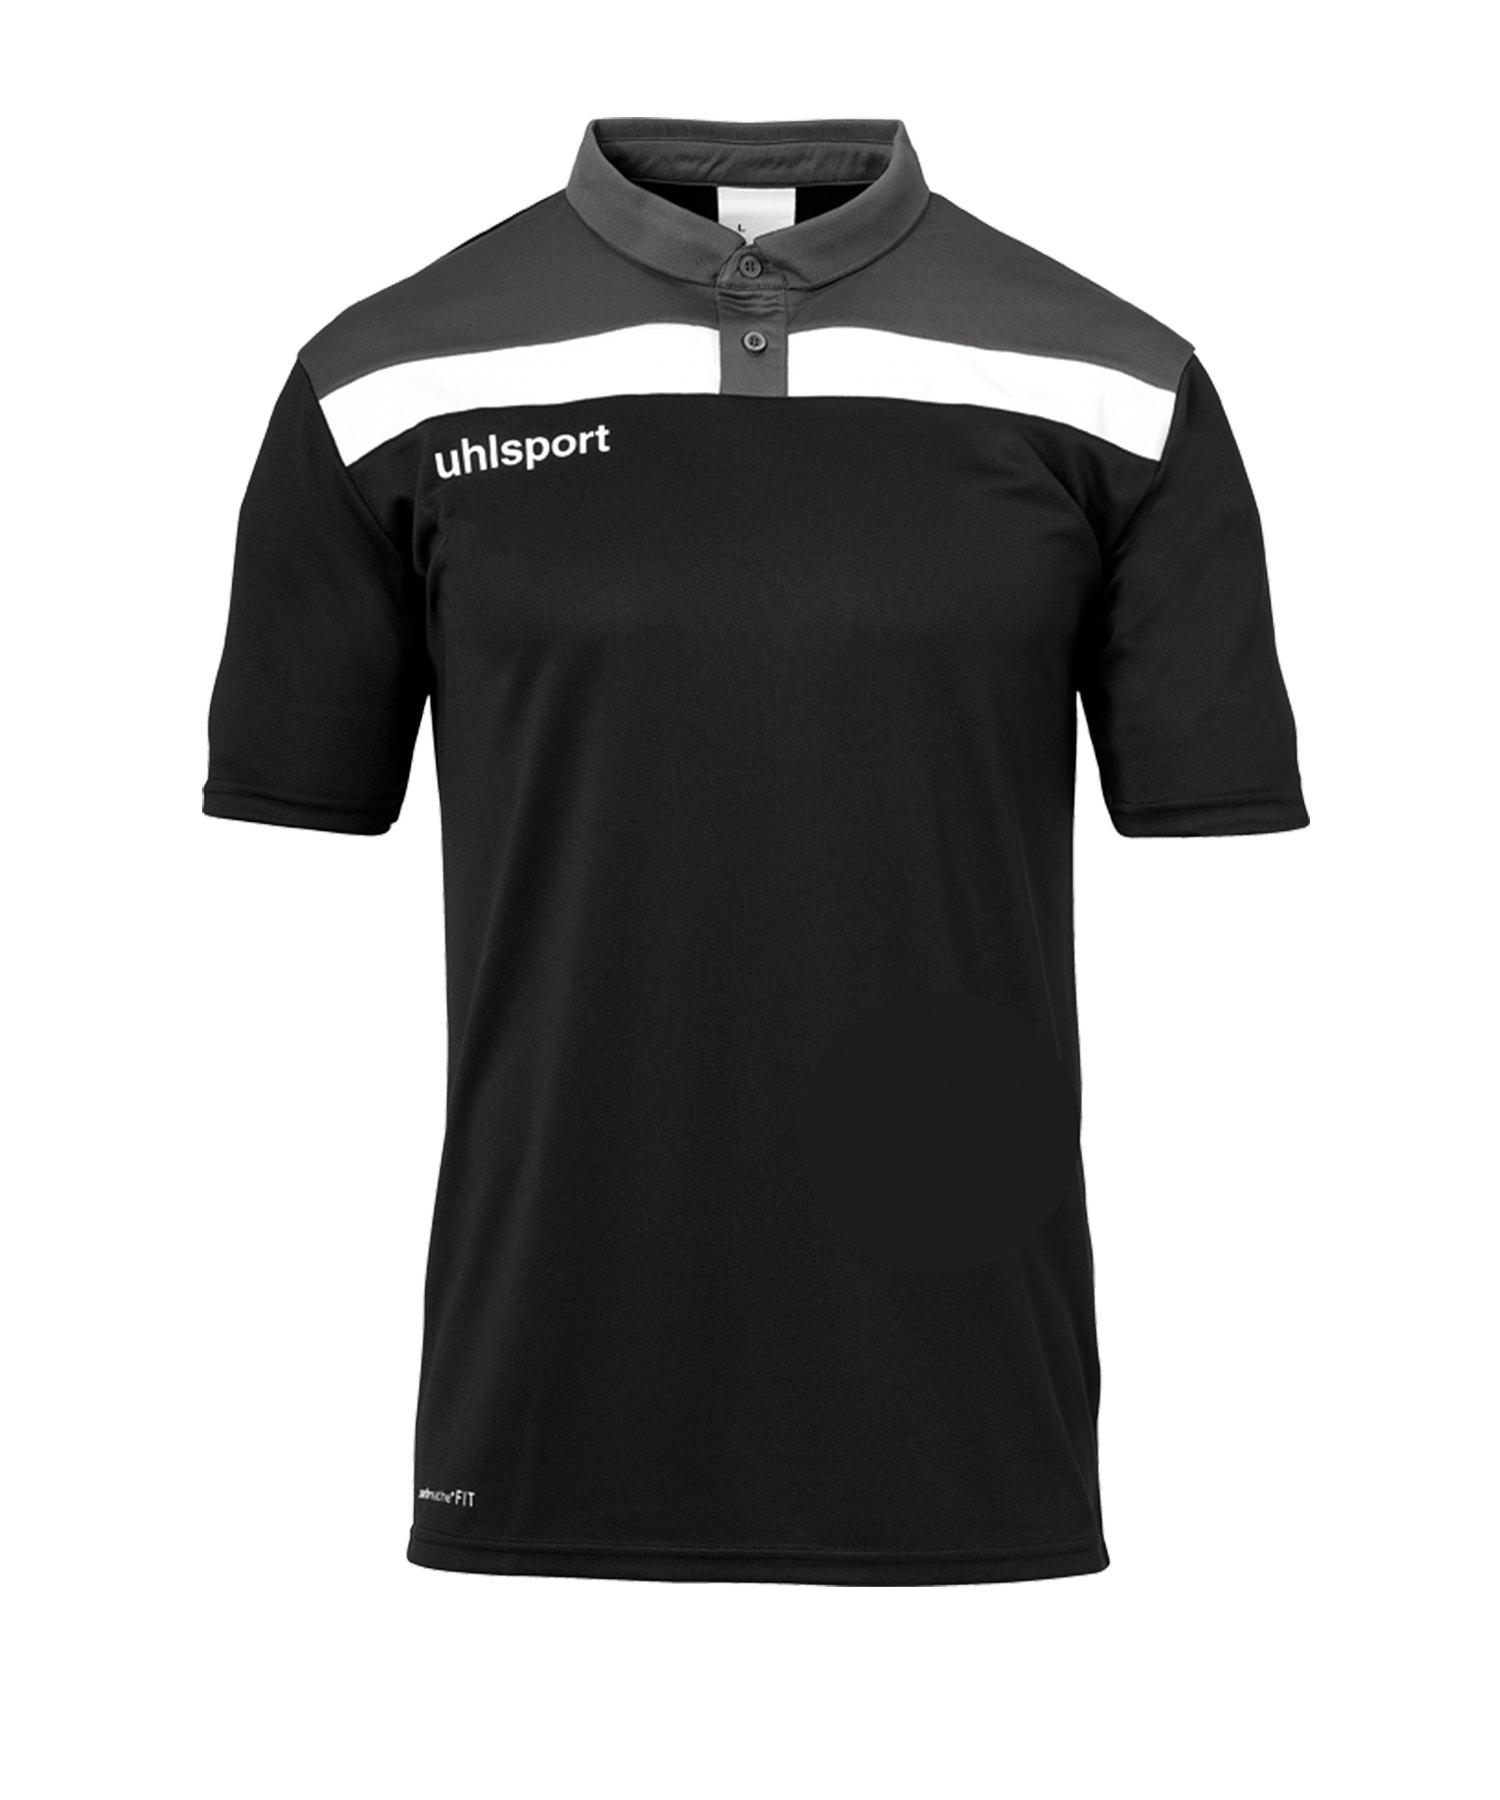 Uhlsport Offense 23 Poloshirt Schwarz Grau F01 - schwarz